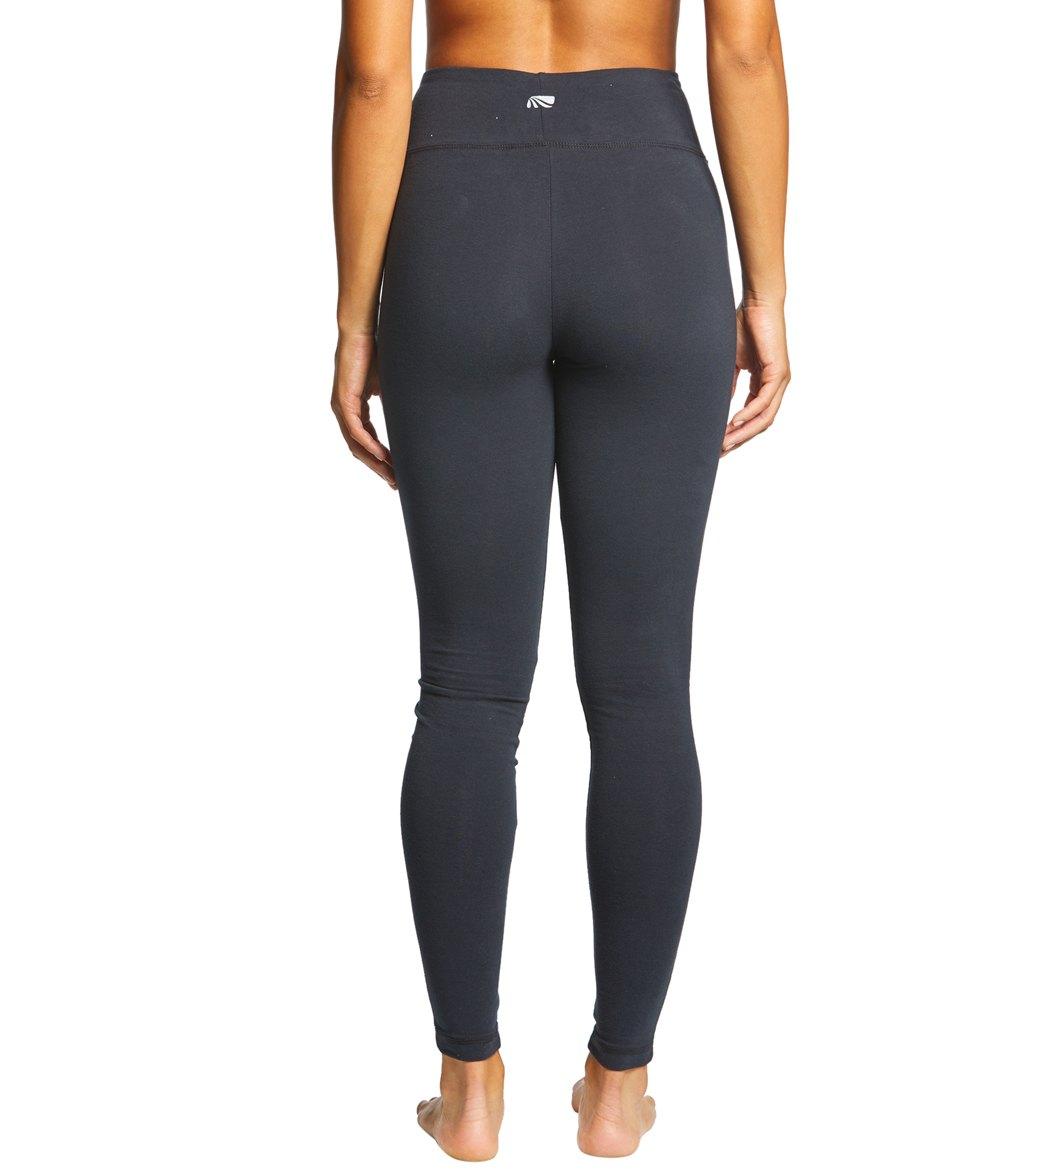 ec30cfba98 Marika Tummy Control Yoga Long Leggings at YogaOutlet.com - Free ...